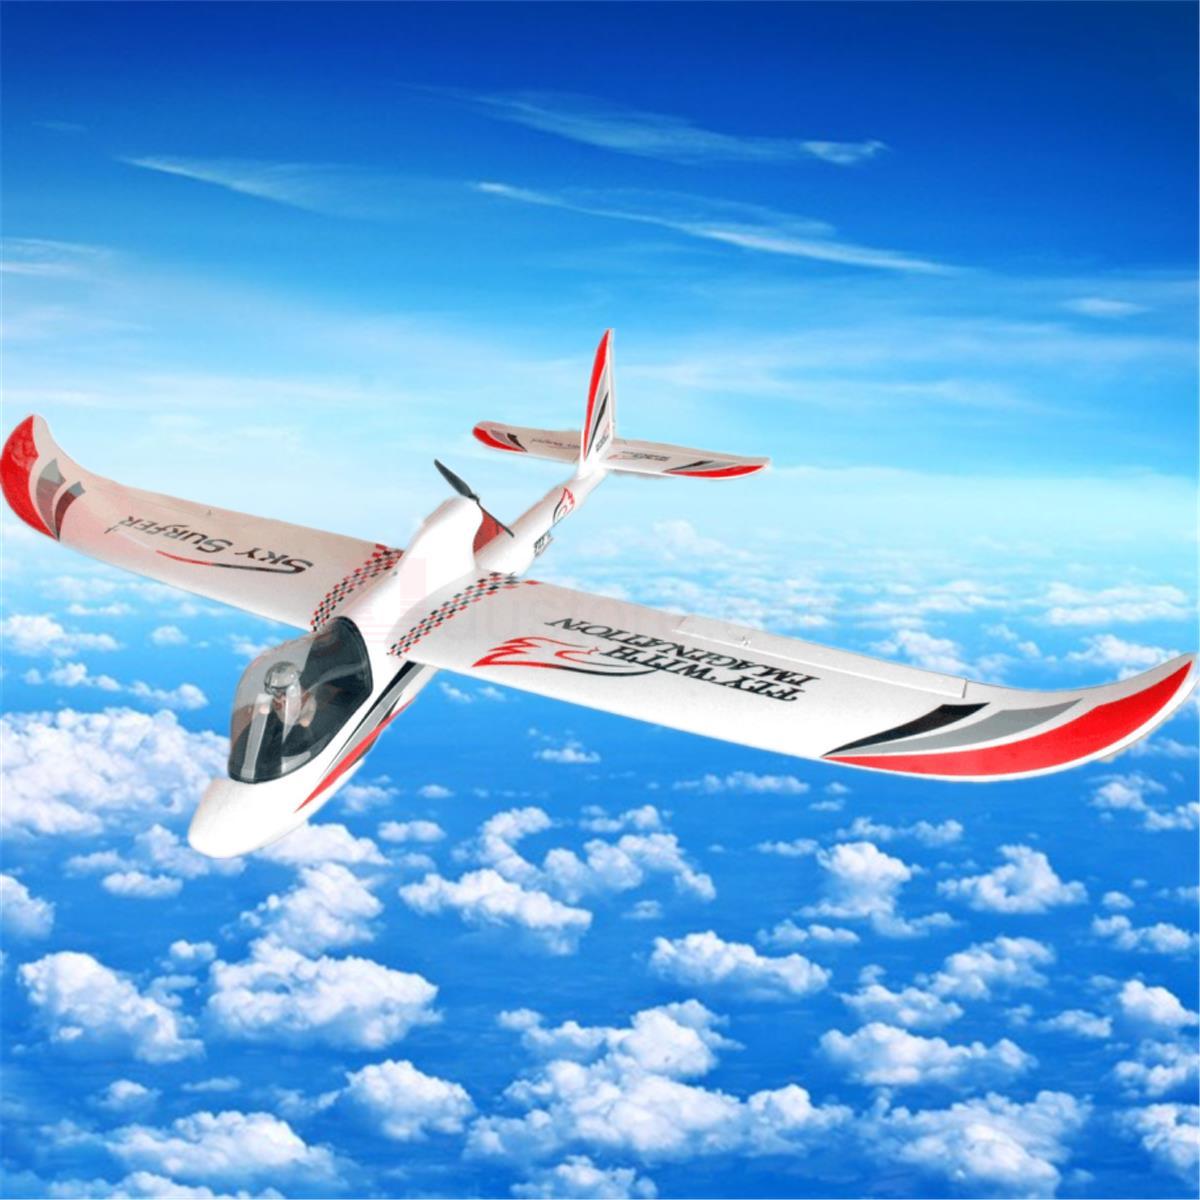 Skysurfer 1500mm wingspan glider plane EPO Kit PNP ARF RC airplane for FPV